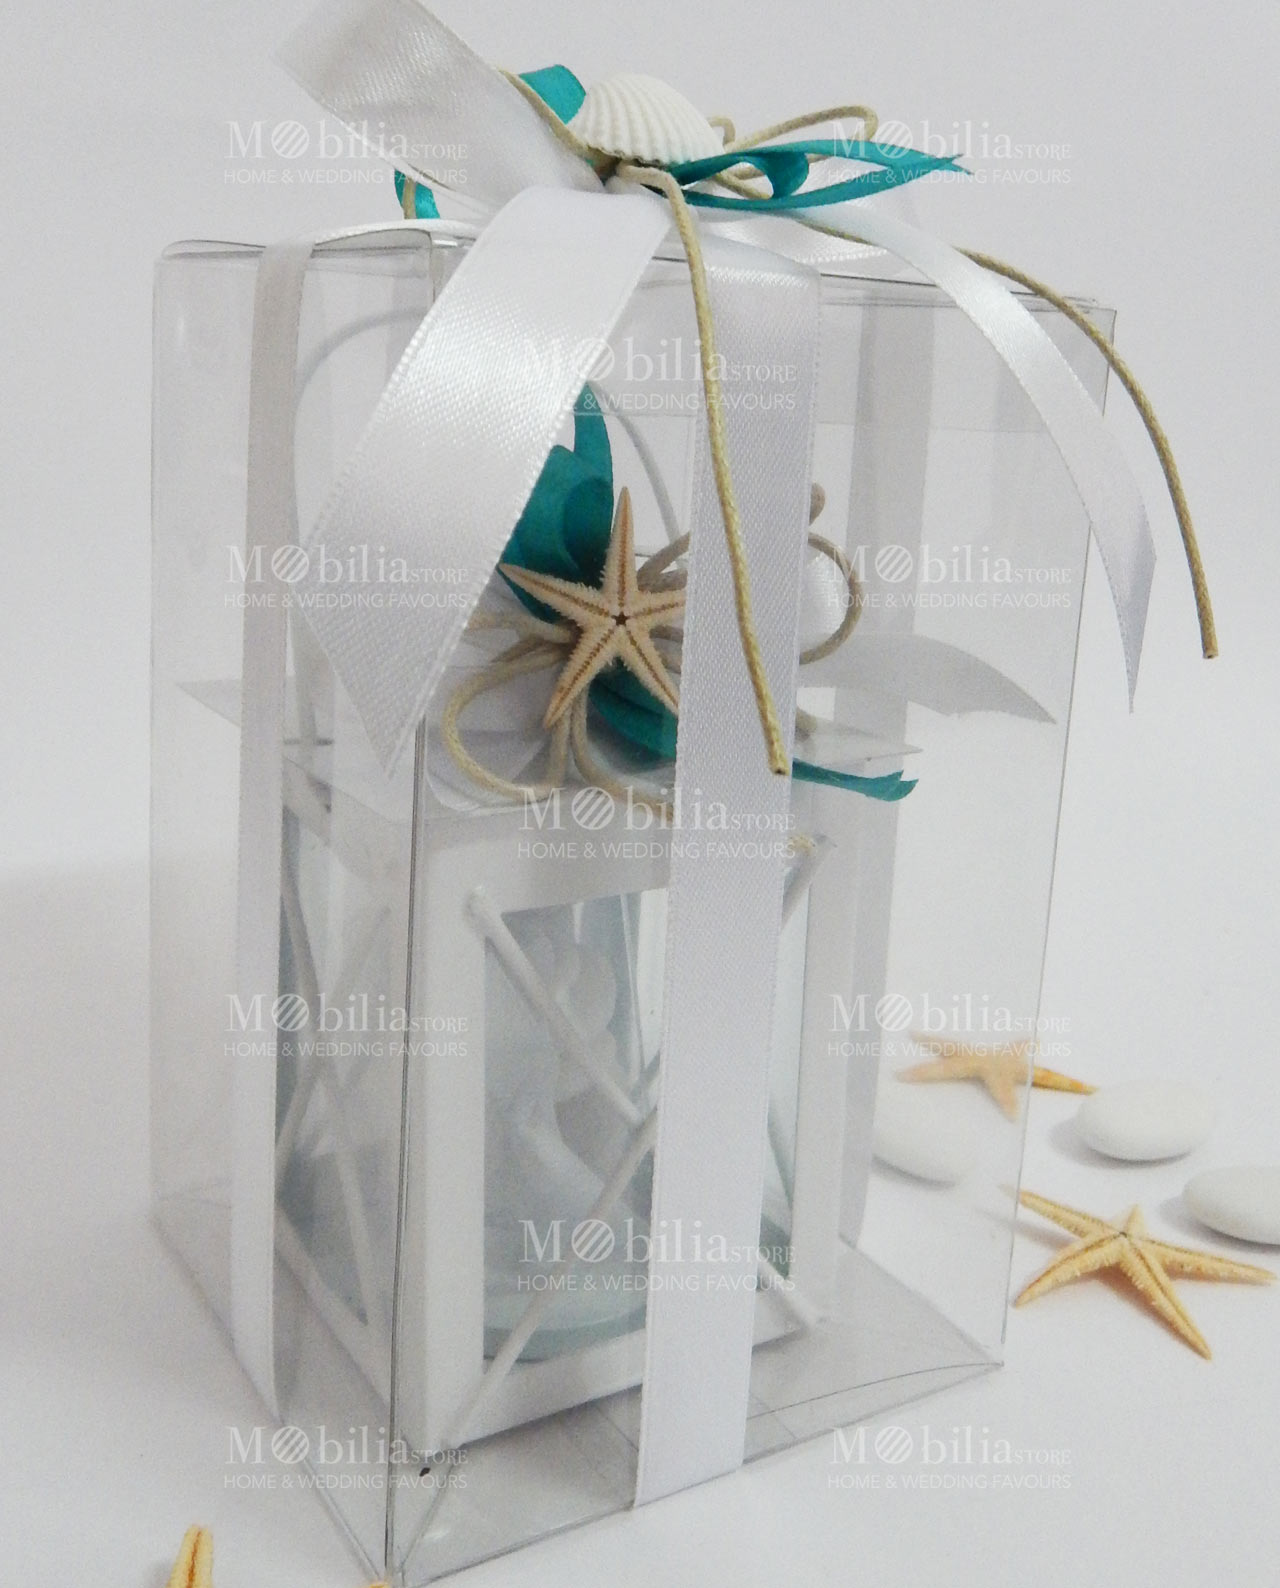 Matrimonio Tema Candele E Lanterne : Bomboniere matrimonio mare xu regardsdefemmes